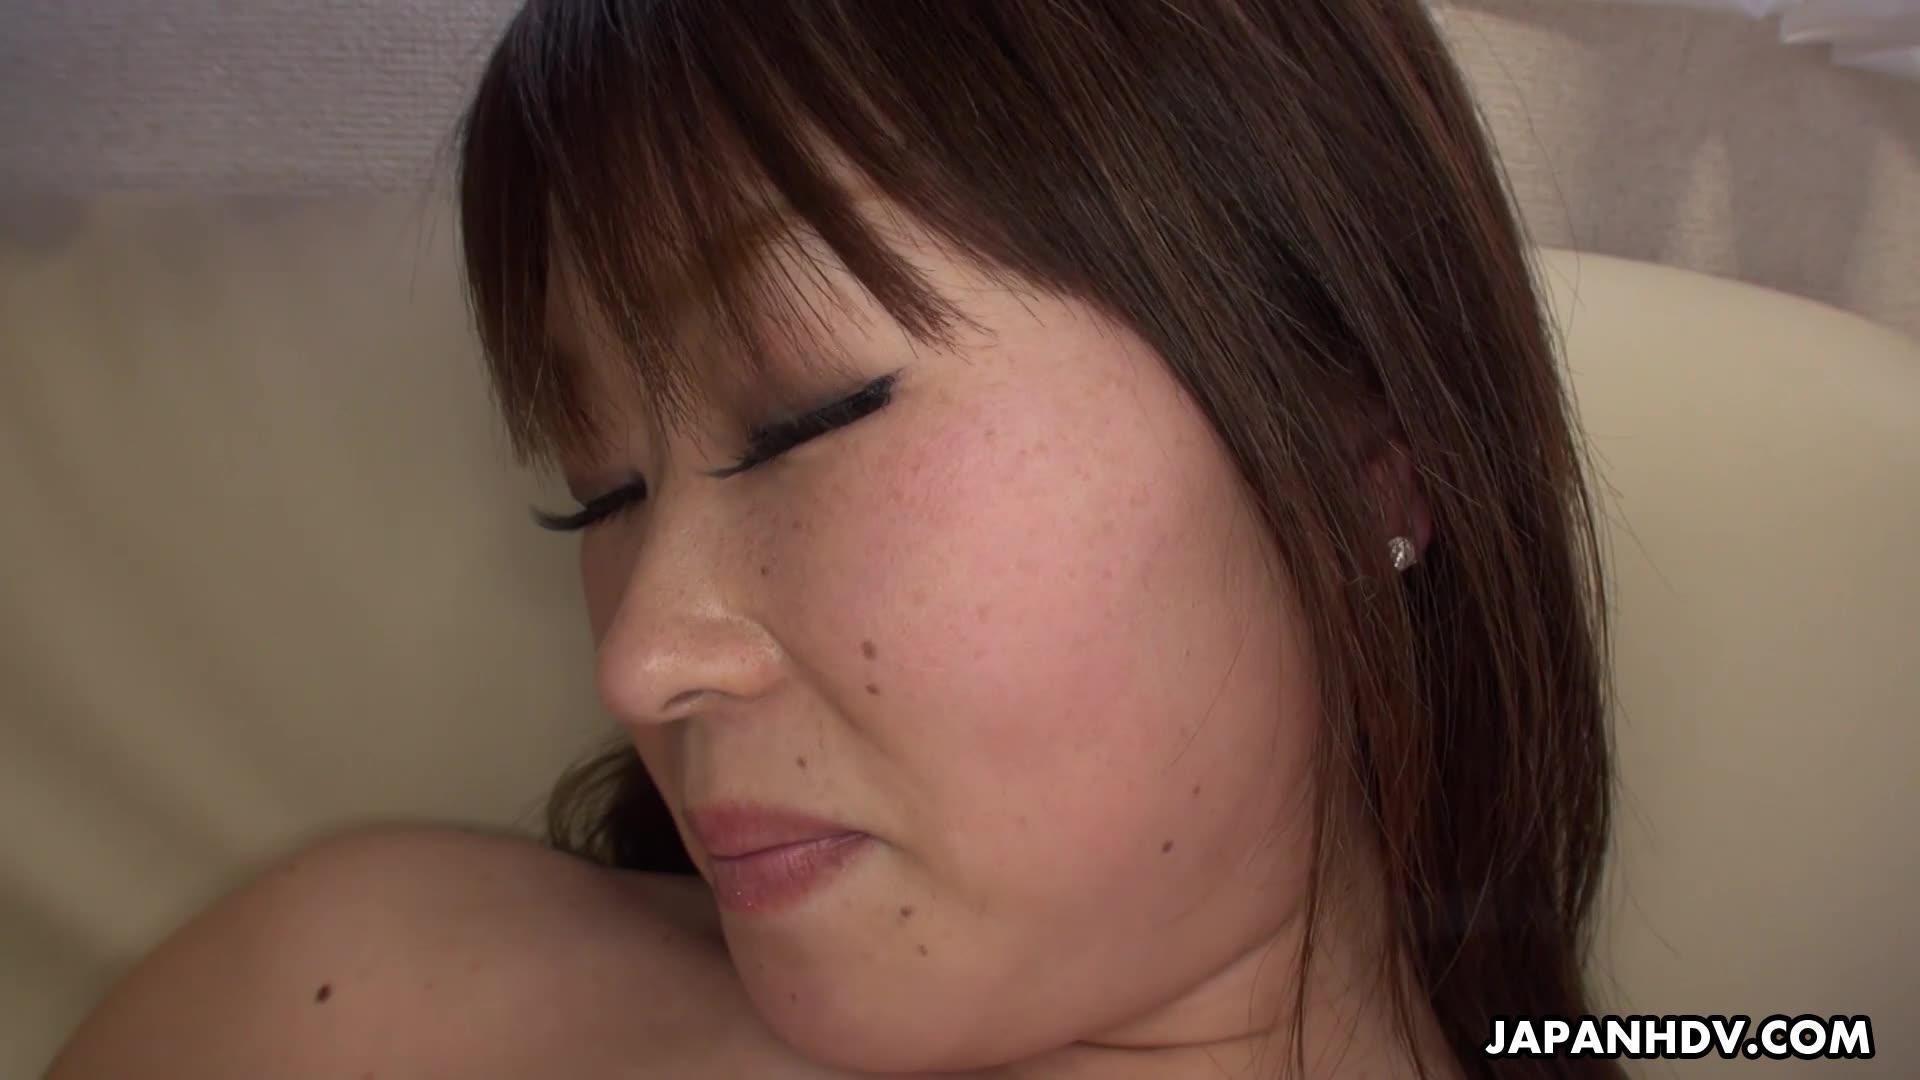 JapanHDV 20 11 30 Manami Nakasugi XXX 1080p MP4-WRB